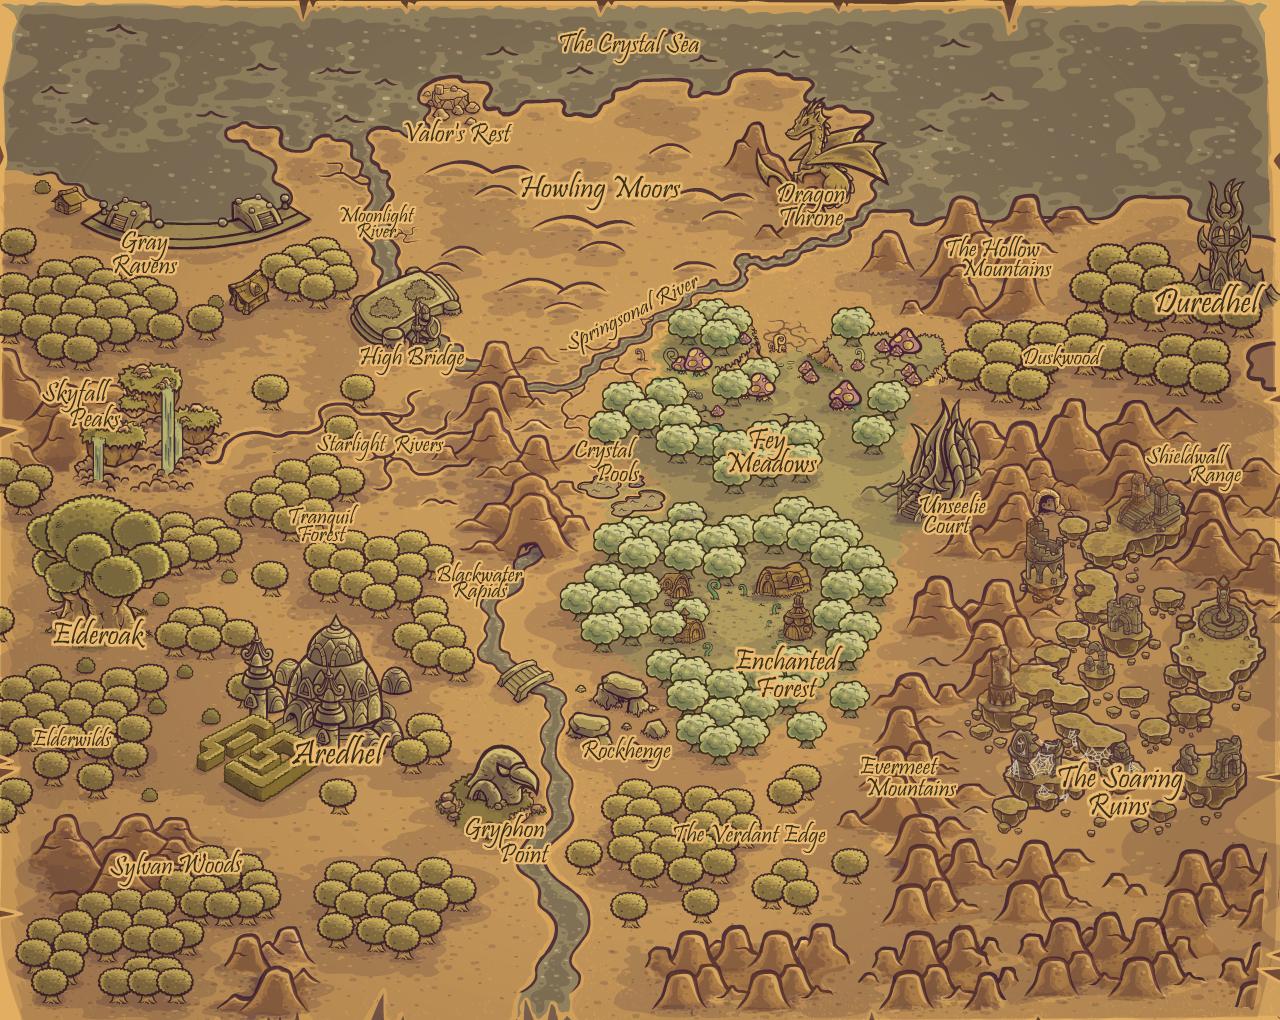 elder scrolls kingdom map, blackwater rush ice and fire map, rush tower map, dwarven kingdom map, on kingdom rush community map